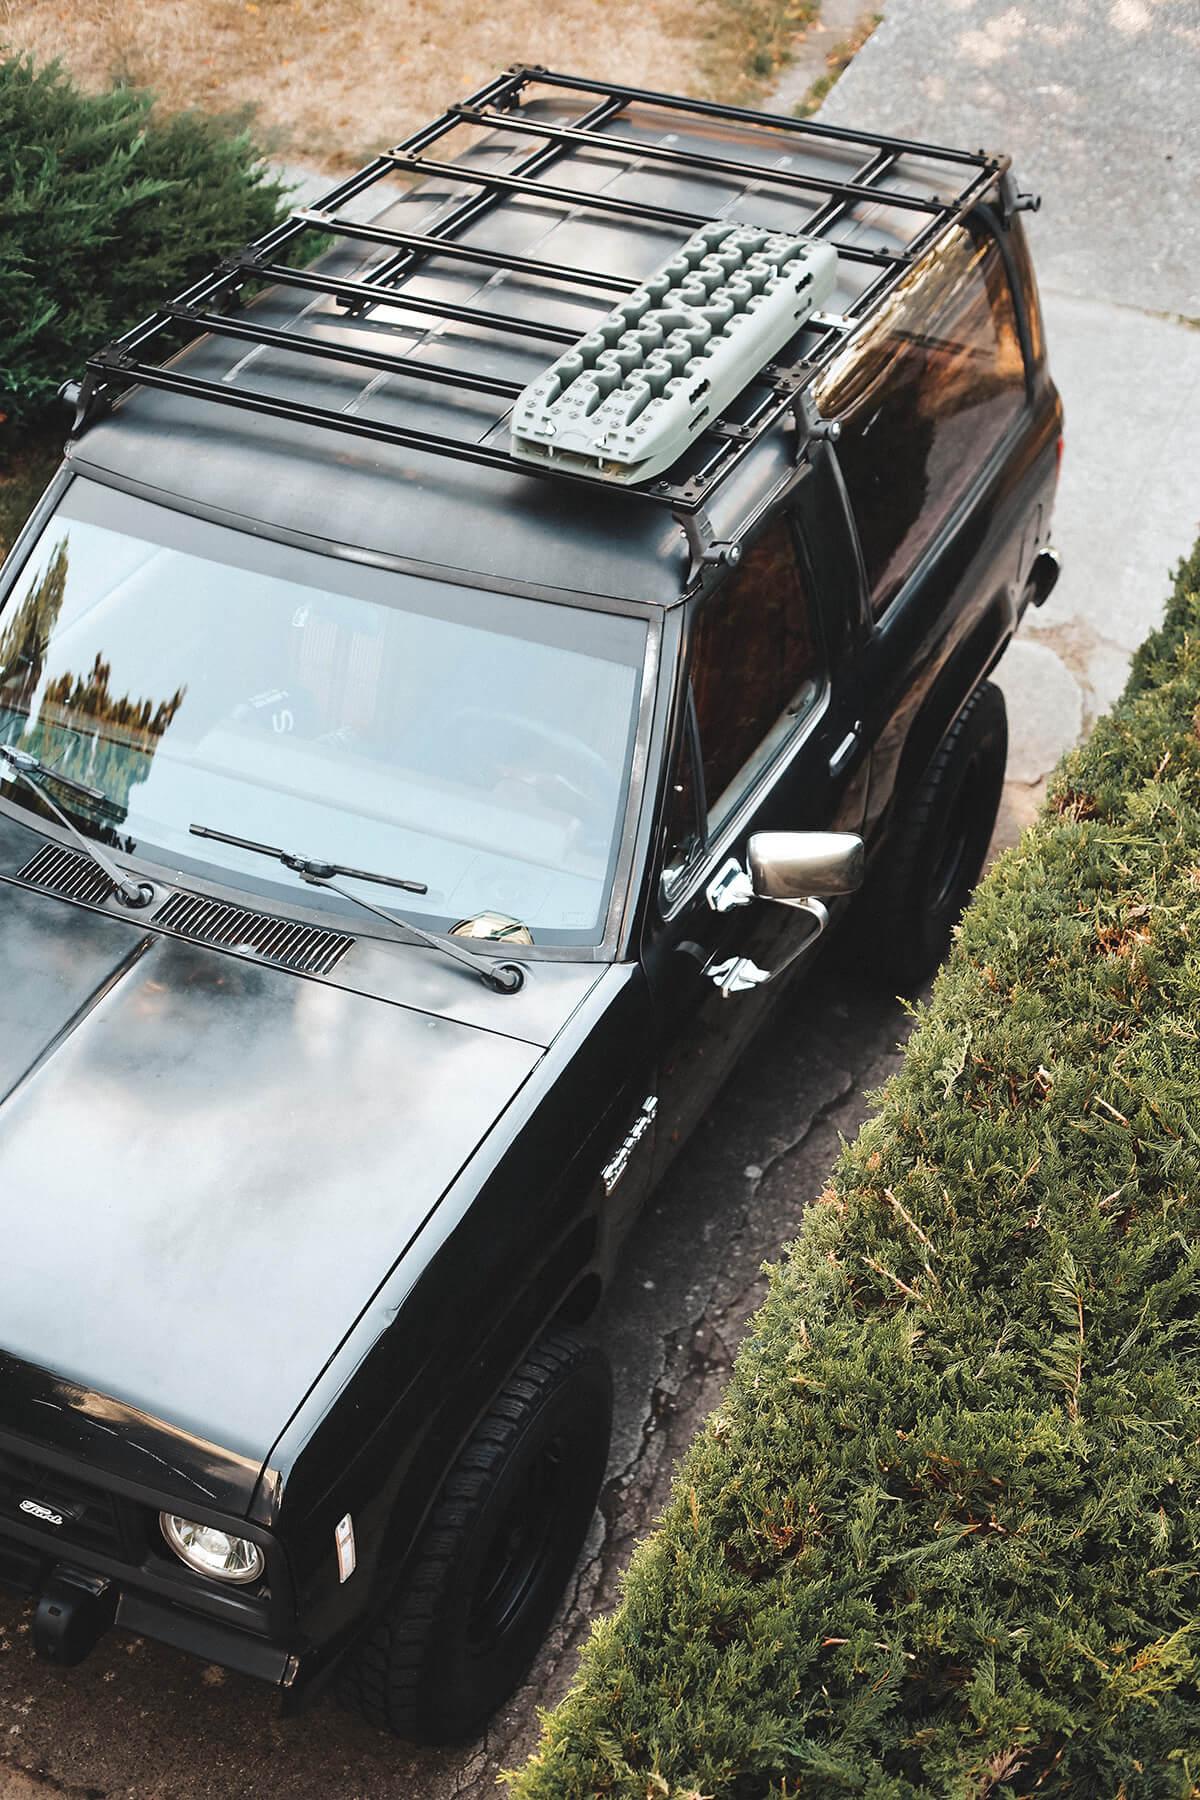 Ford Bronco II roof rack cargo basket